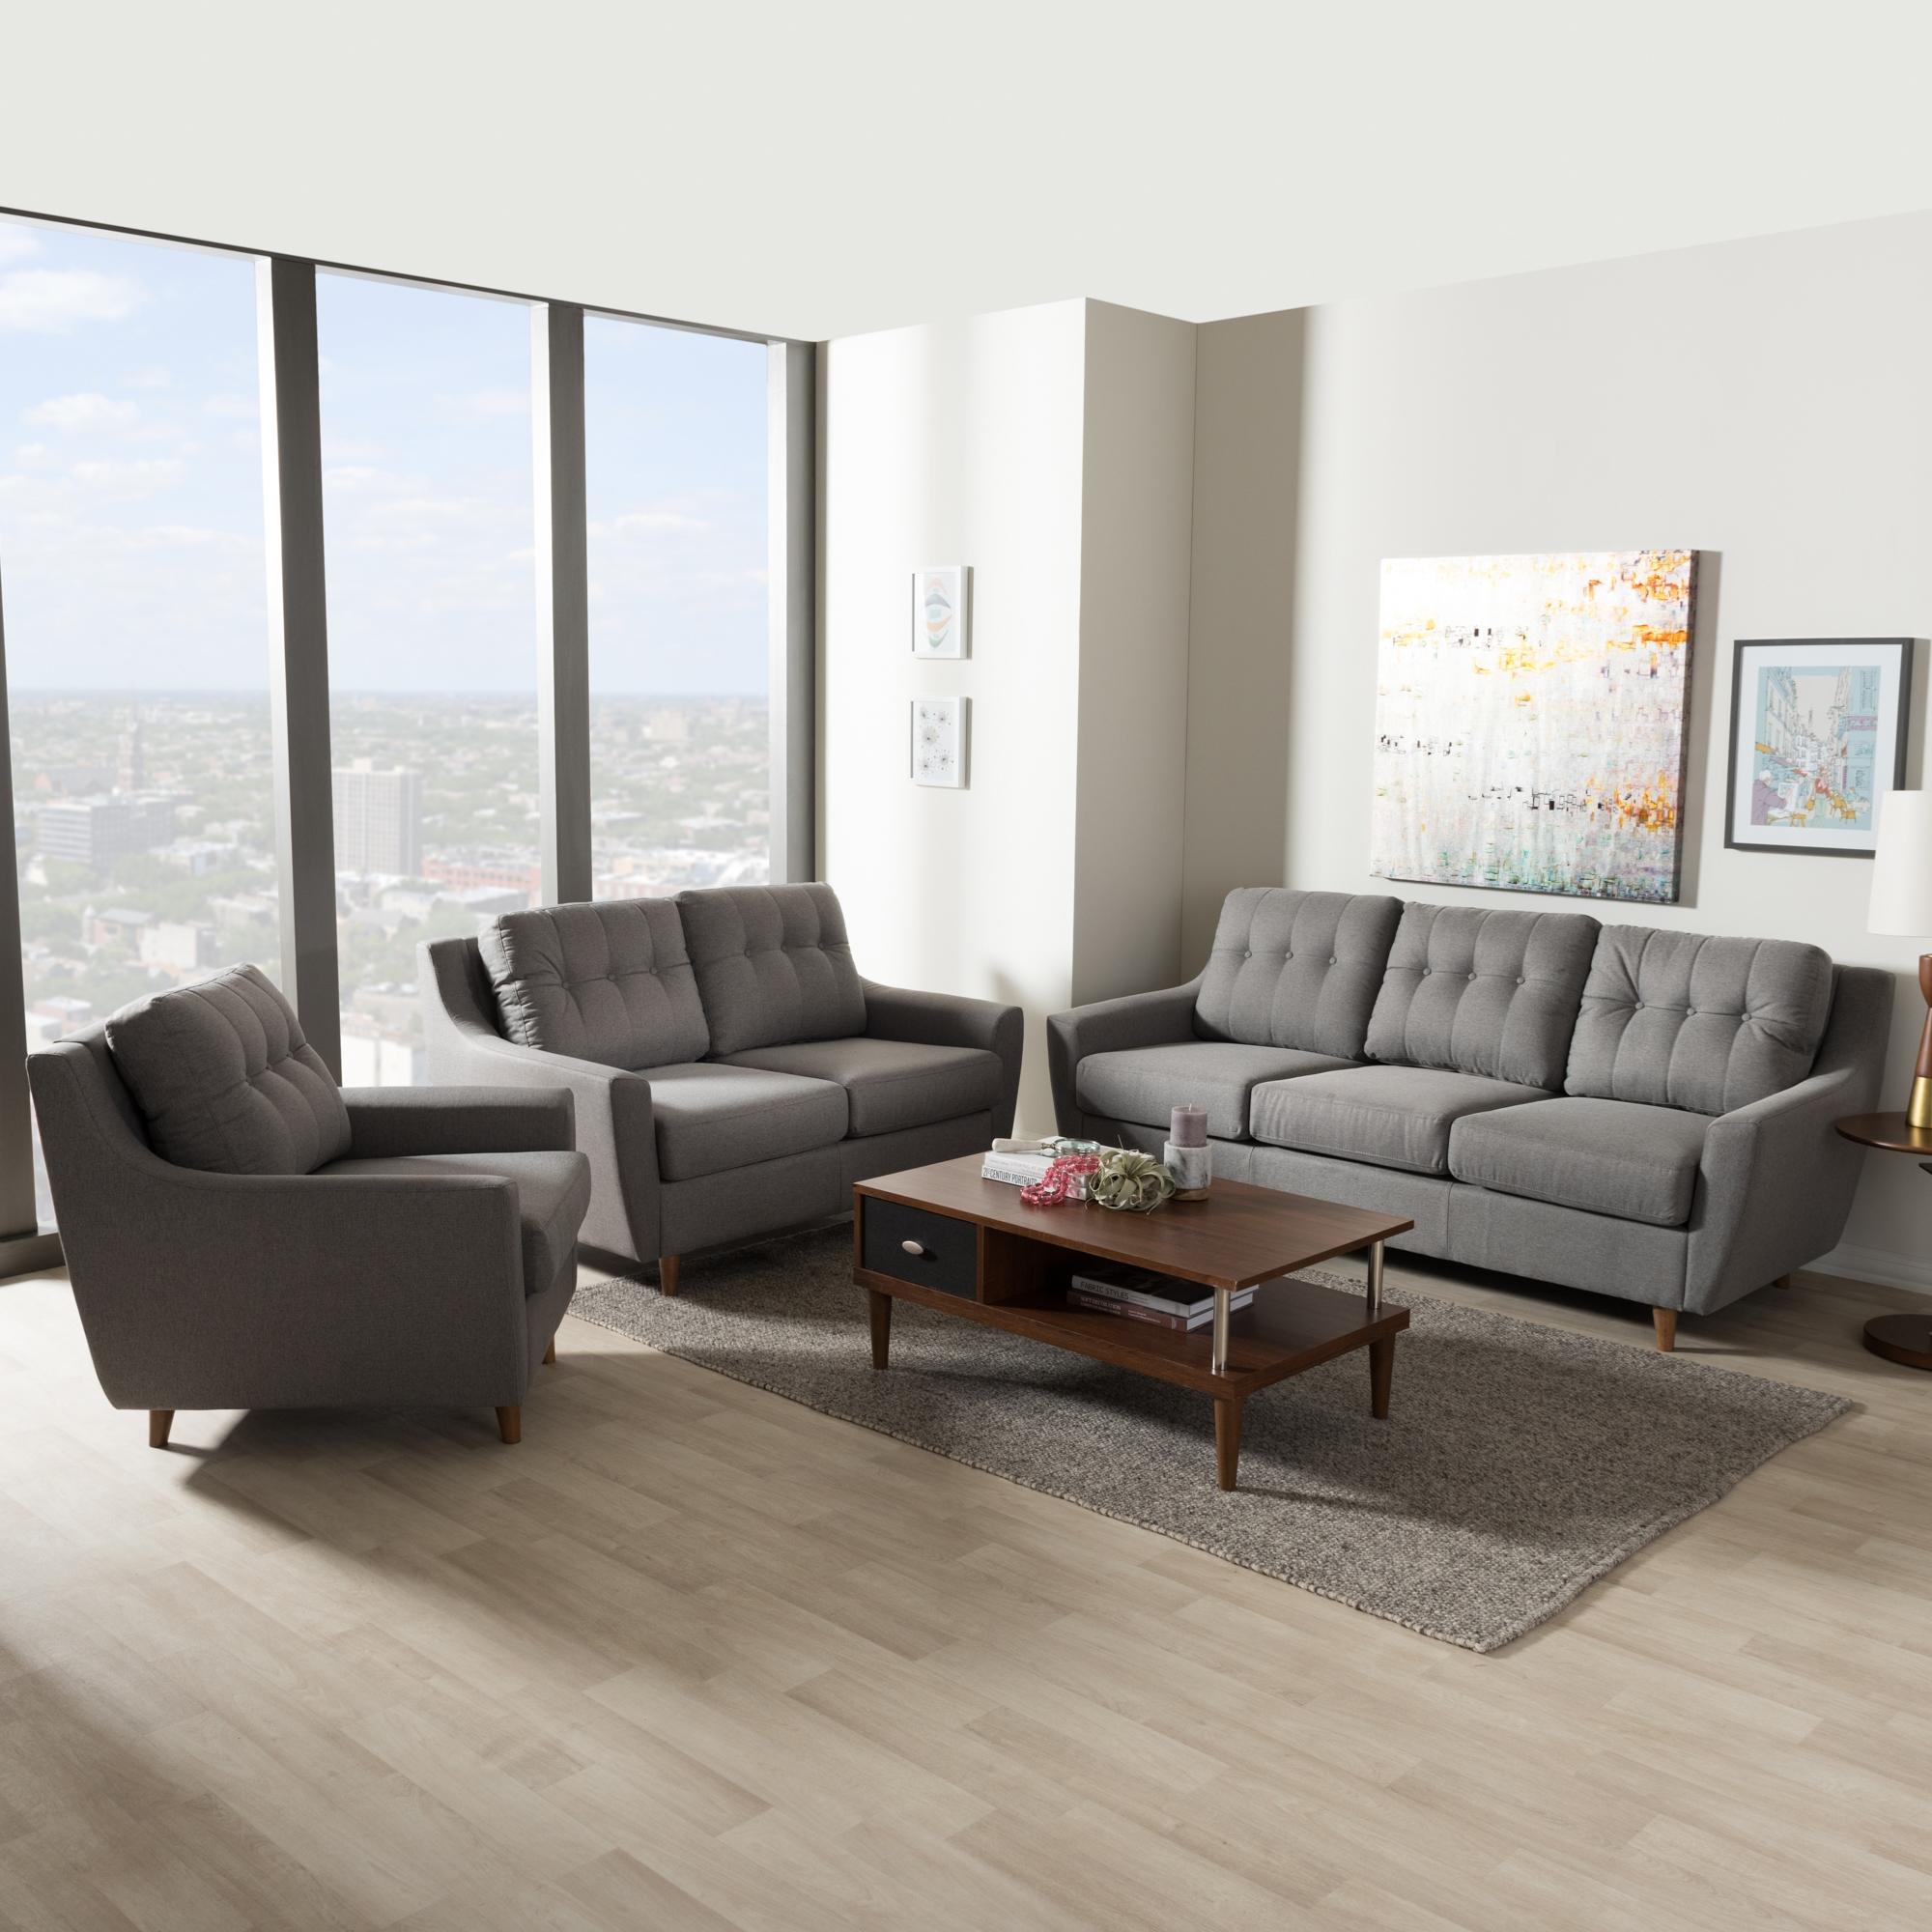 ... Baxton Studio Mckenzie Mid Century Modern Grey Fabric Upholstered  Tufted 3 Piece Livingroom Set ...